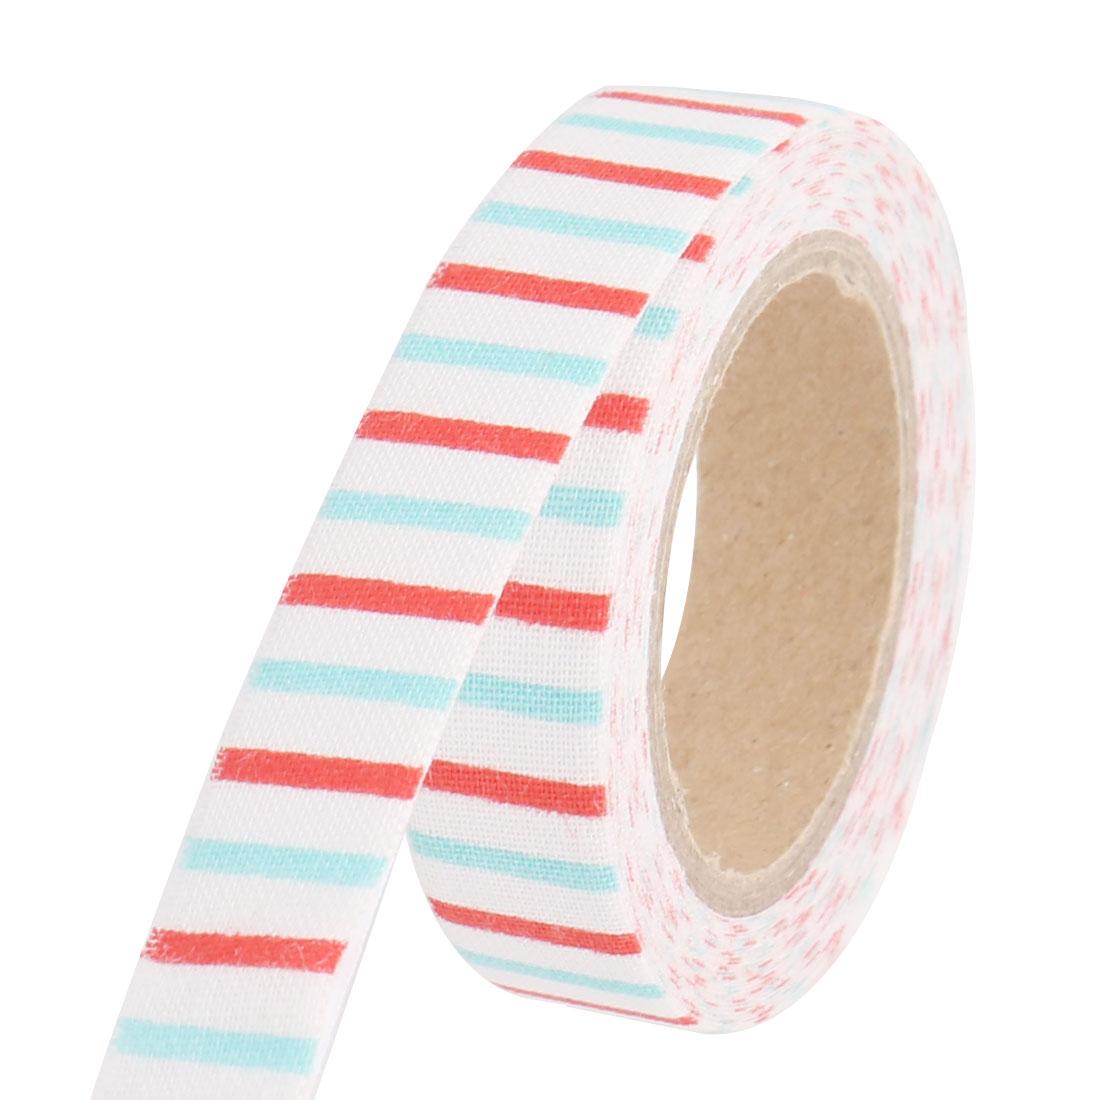 Stripe Pattern Scrapbooking DIY Craft Decorative Masking Sticky Tape Roll Sky Blue Red